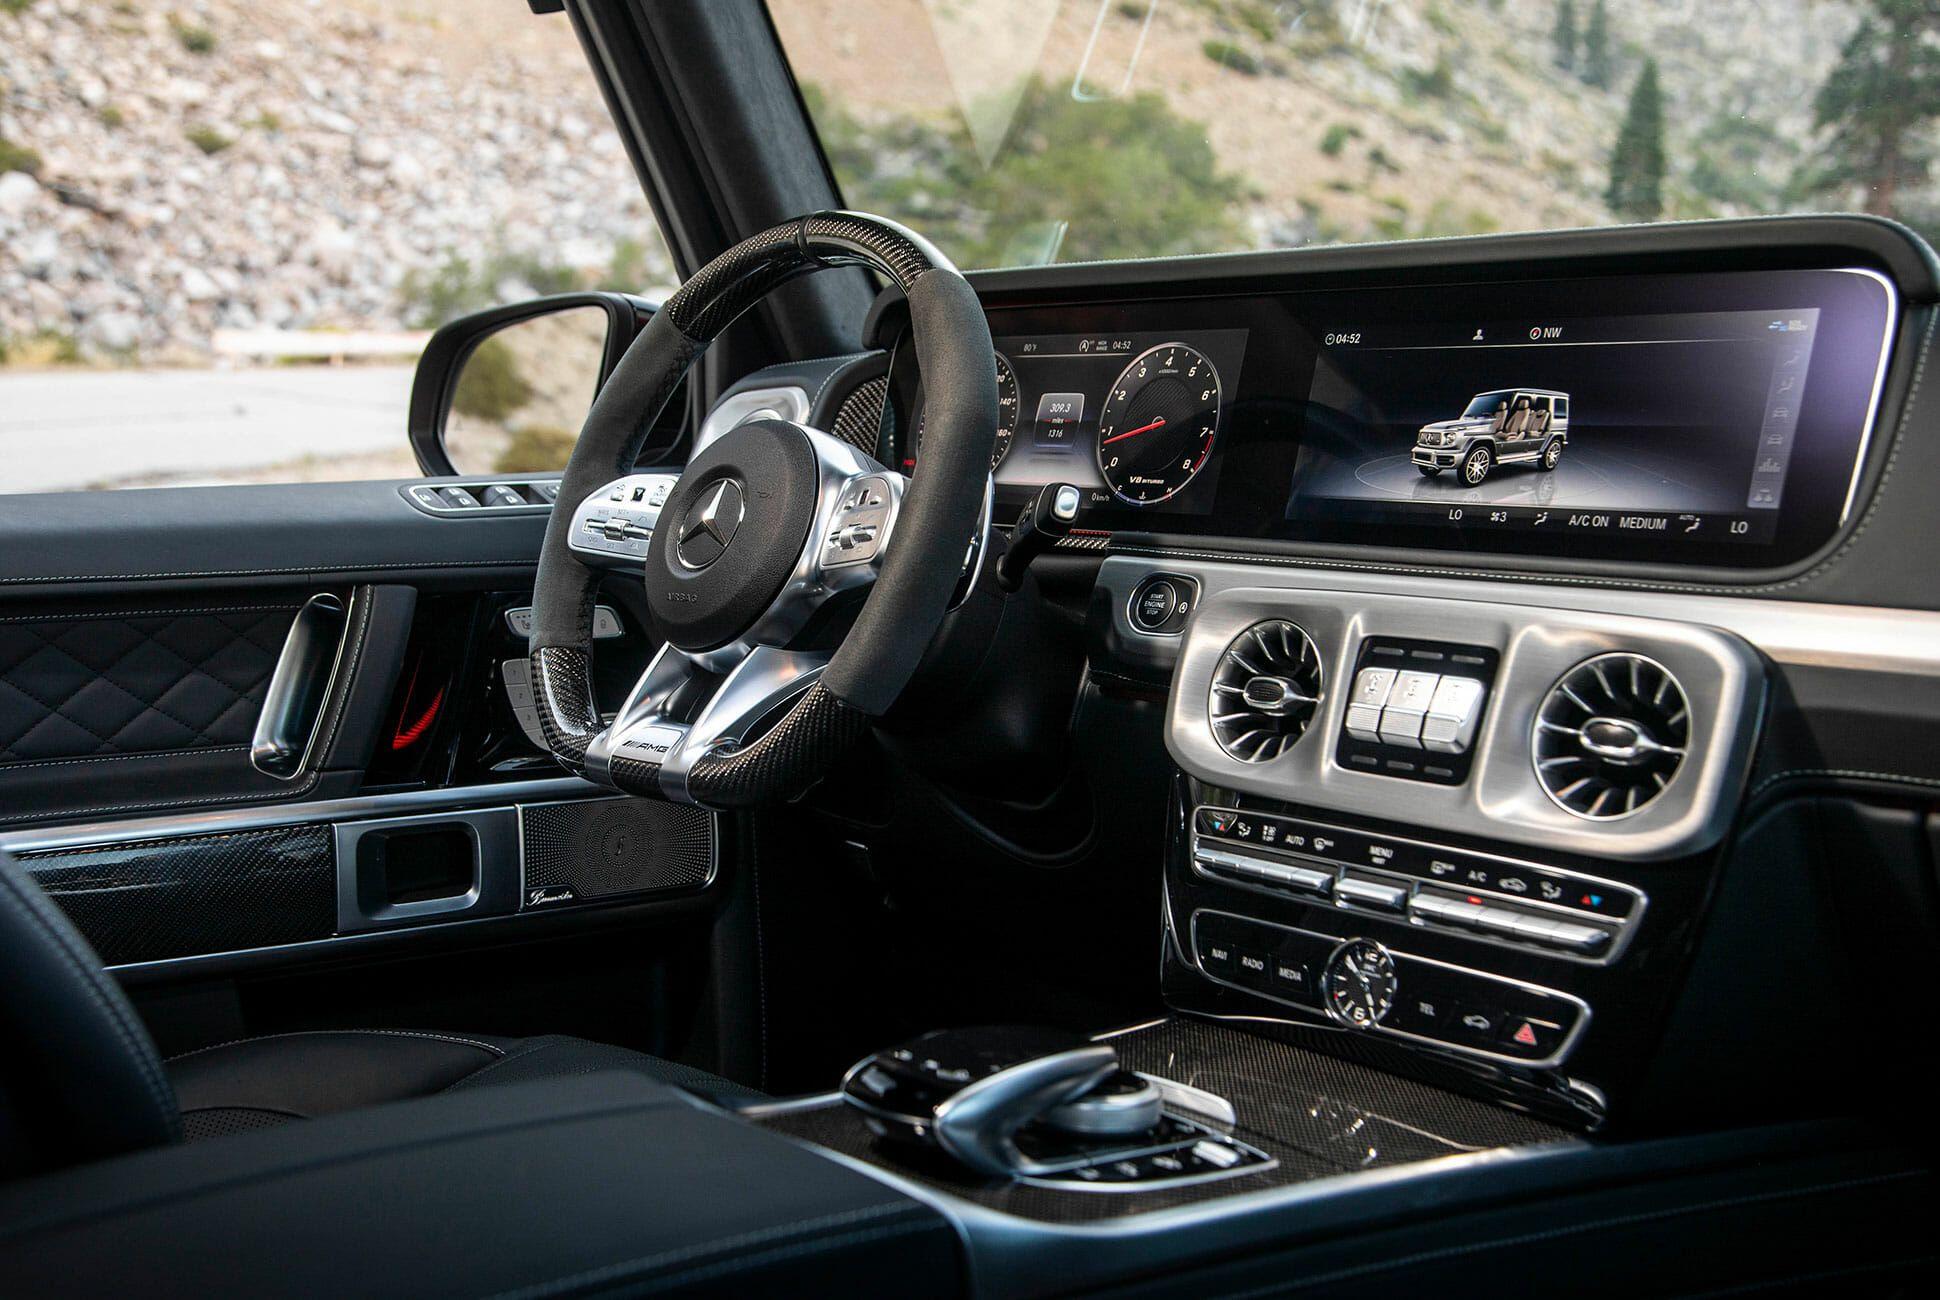 2019-Mercedes-AMG-G63-Review-gear-patrol-slide-4